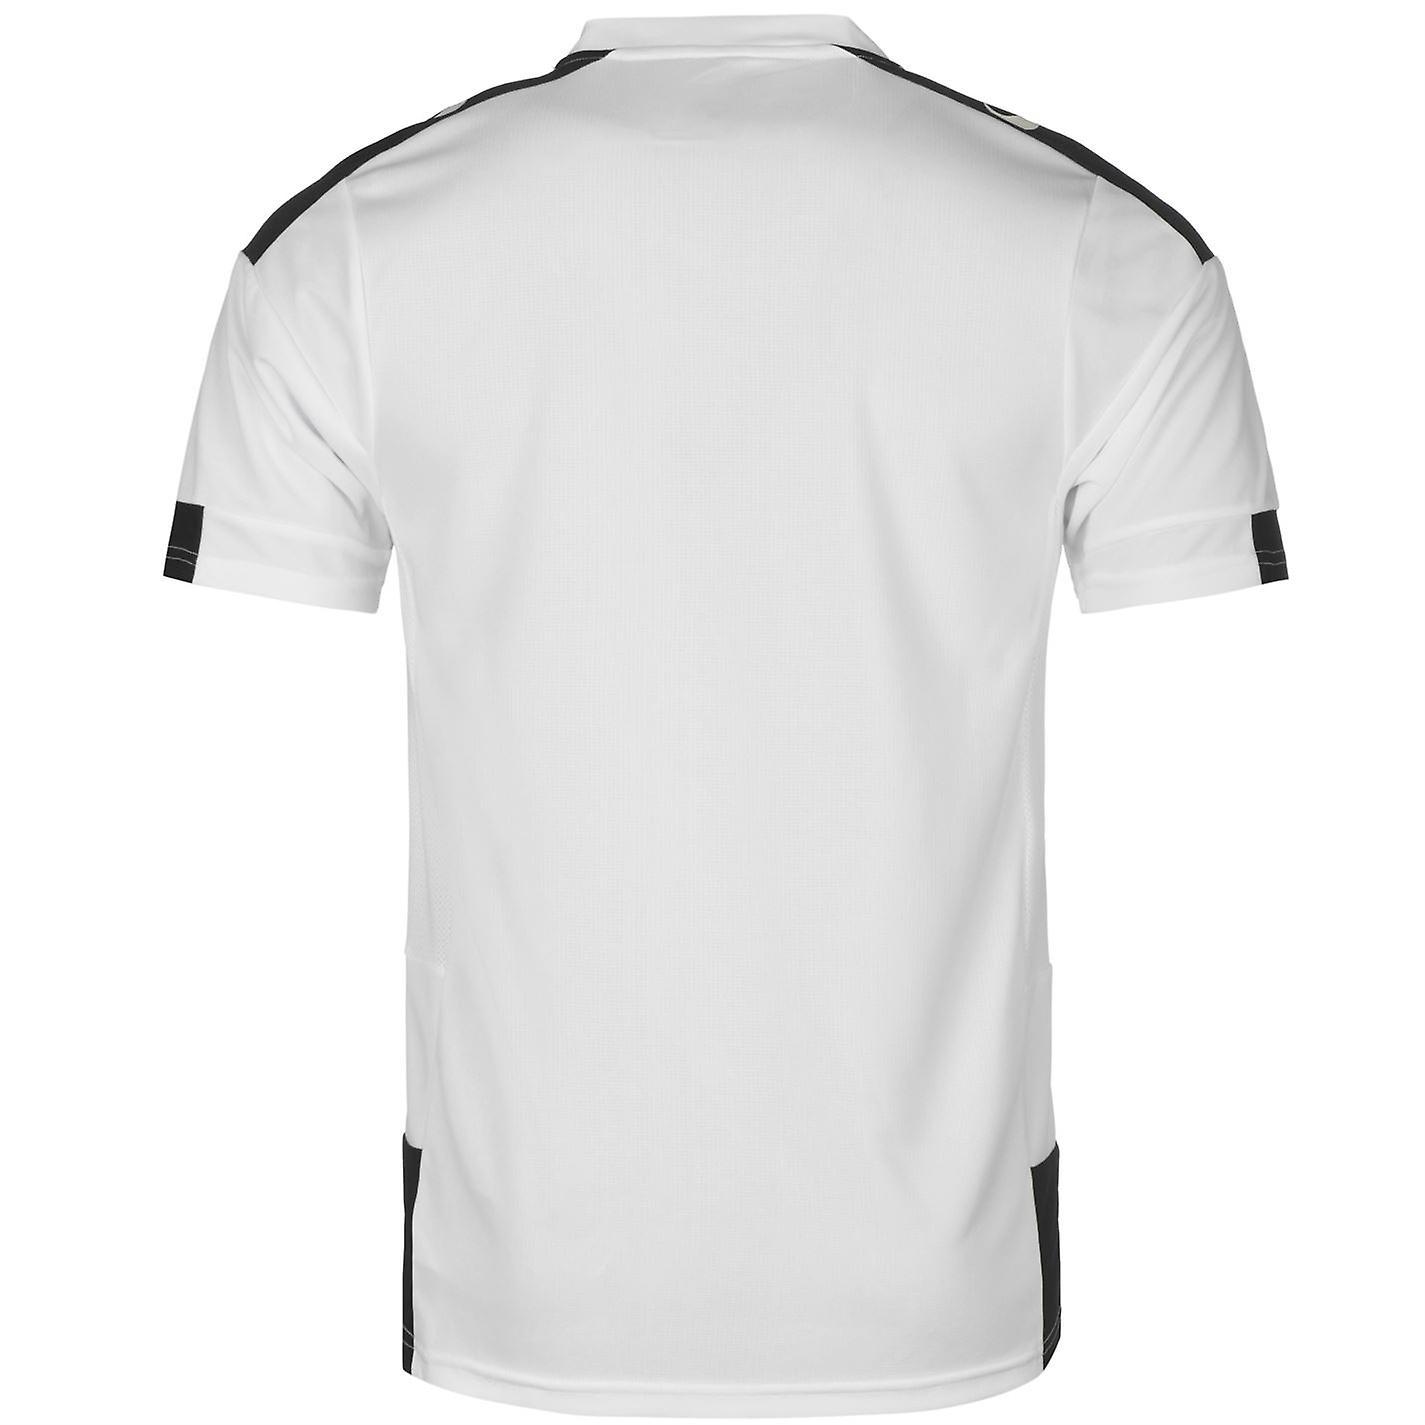 Sondico Mens Gents Training Jersey Light Football Short Sleeve Tee Clothing